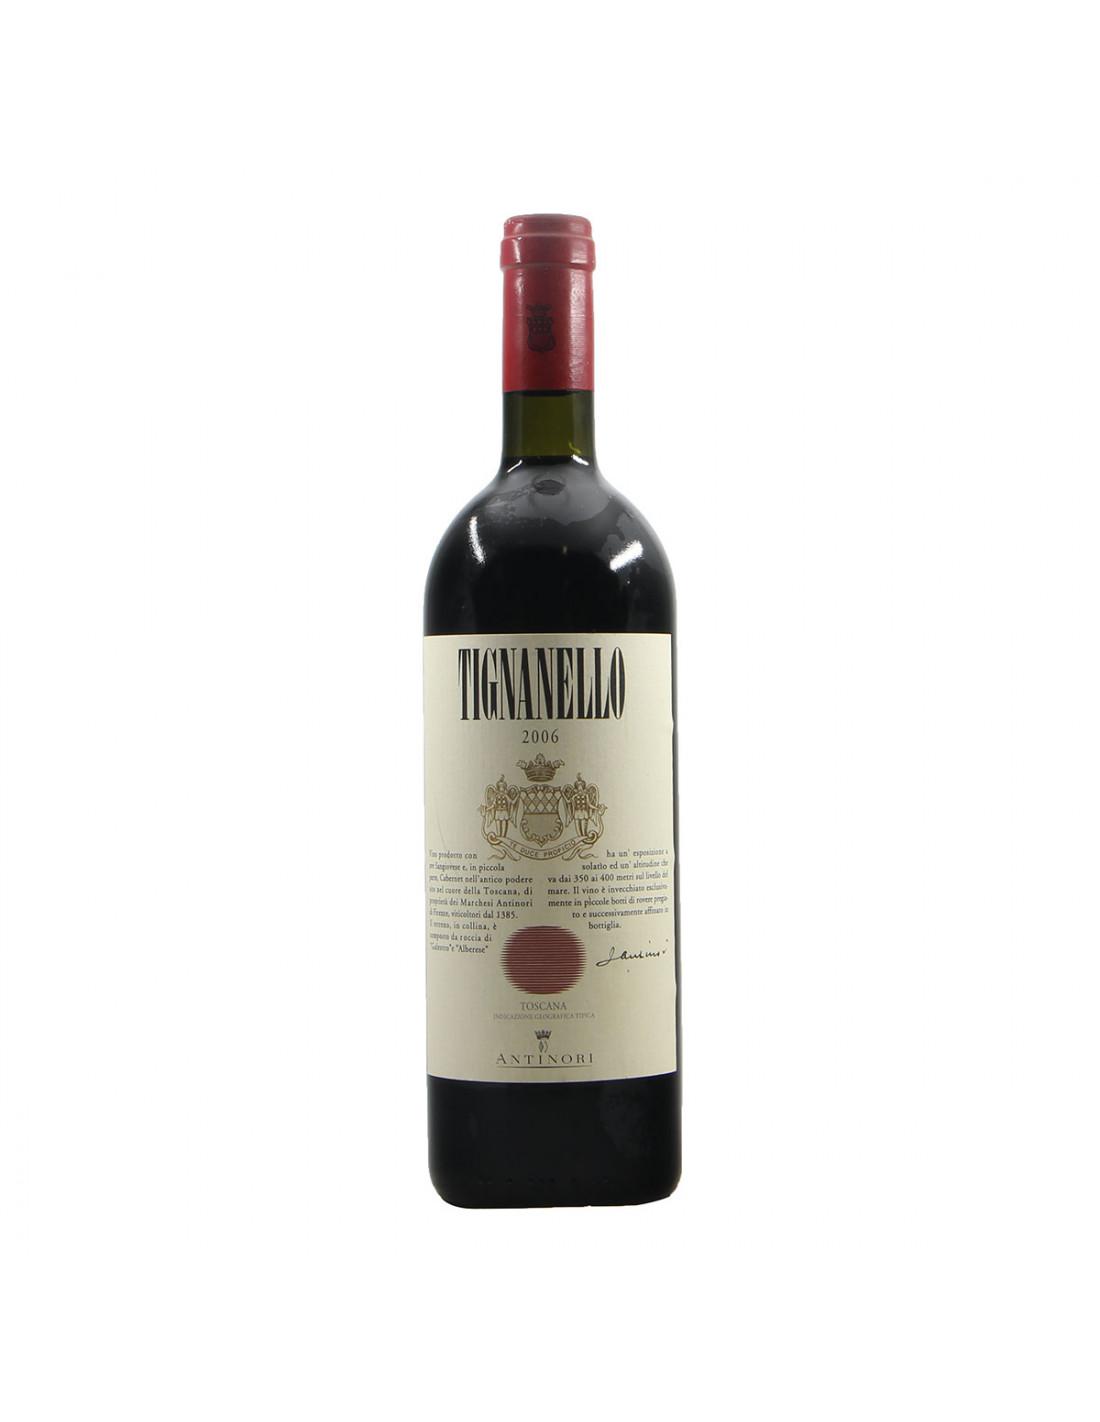 Antinori Tignanello 2006 Grandi Bottiglie